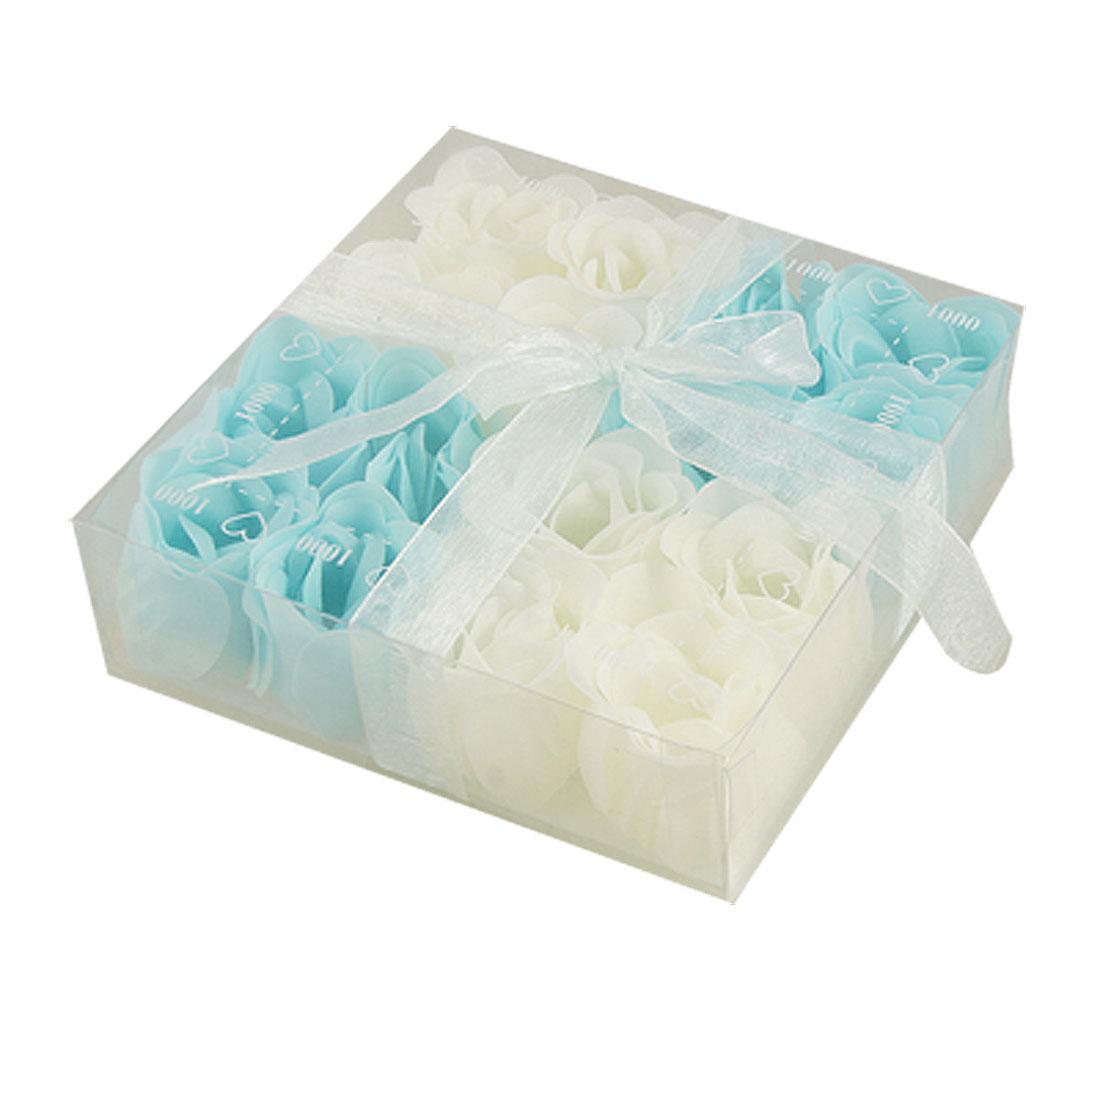 Baby Blue White 16 Pcs Scented Bath Soap Rose Petal Gift